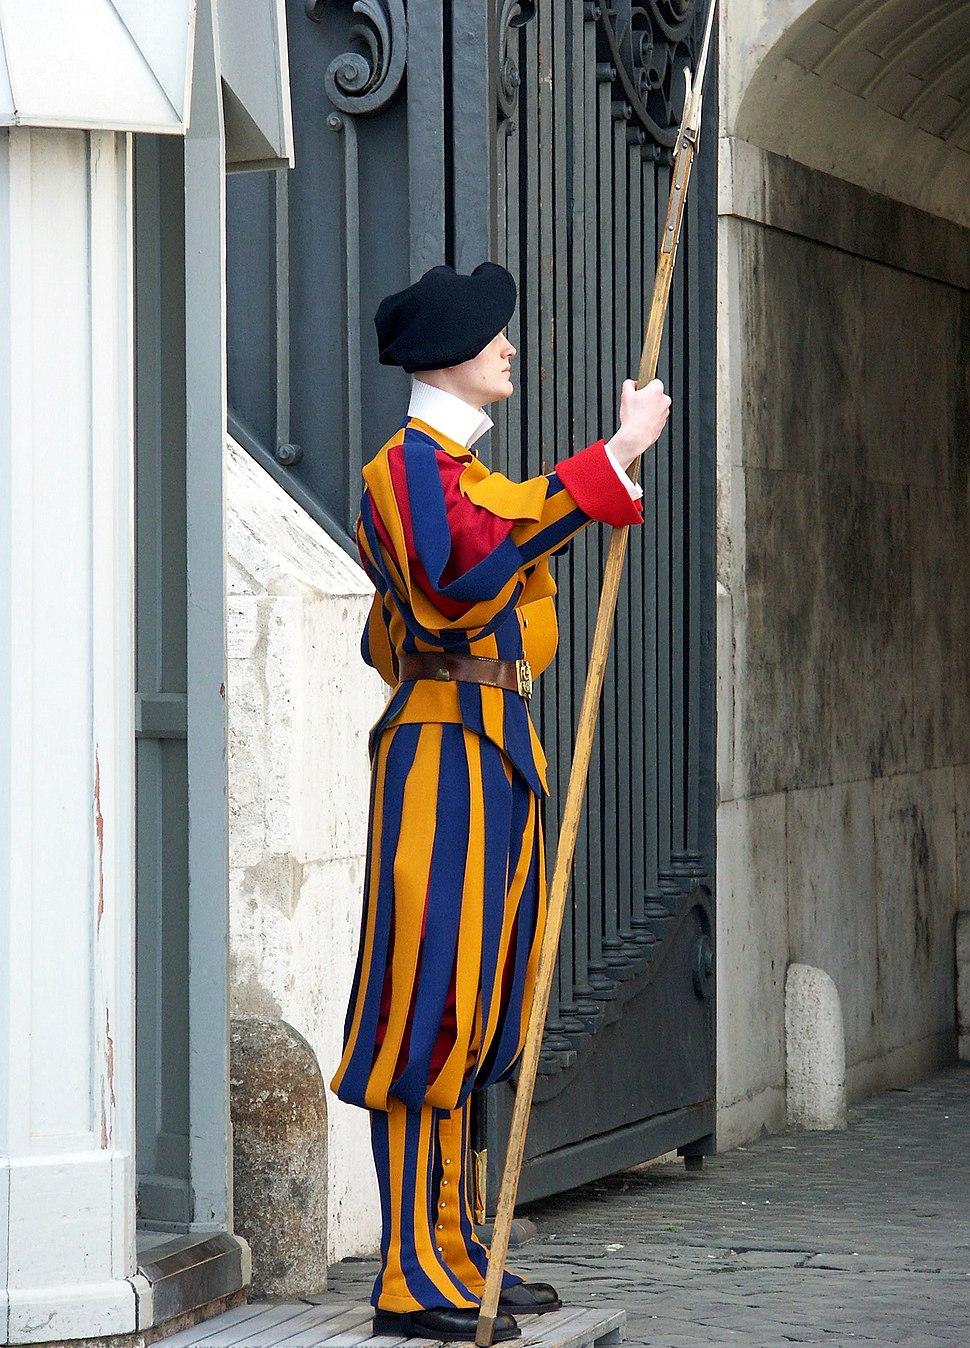 Rom, Vatikan, Soldat der Schweizer Garde 3